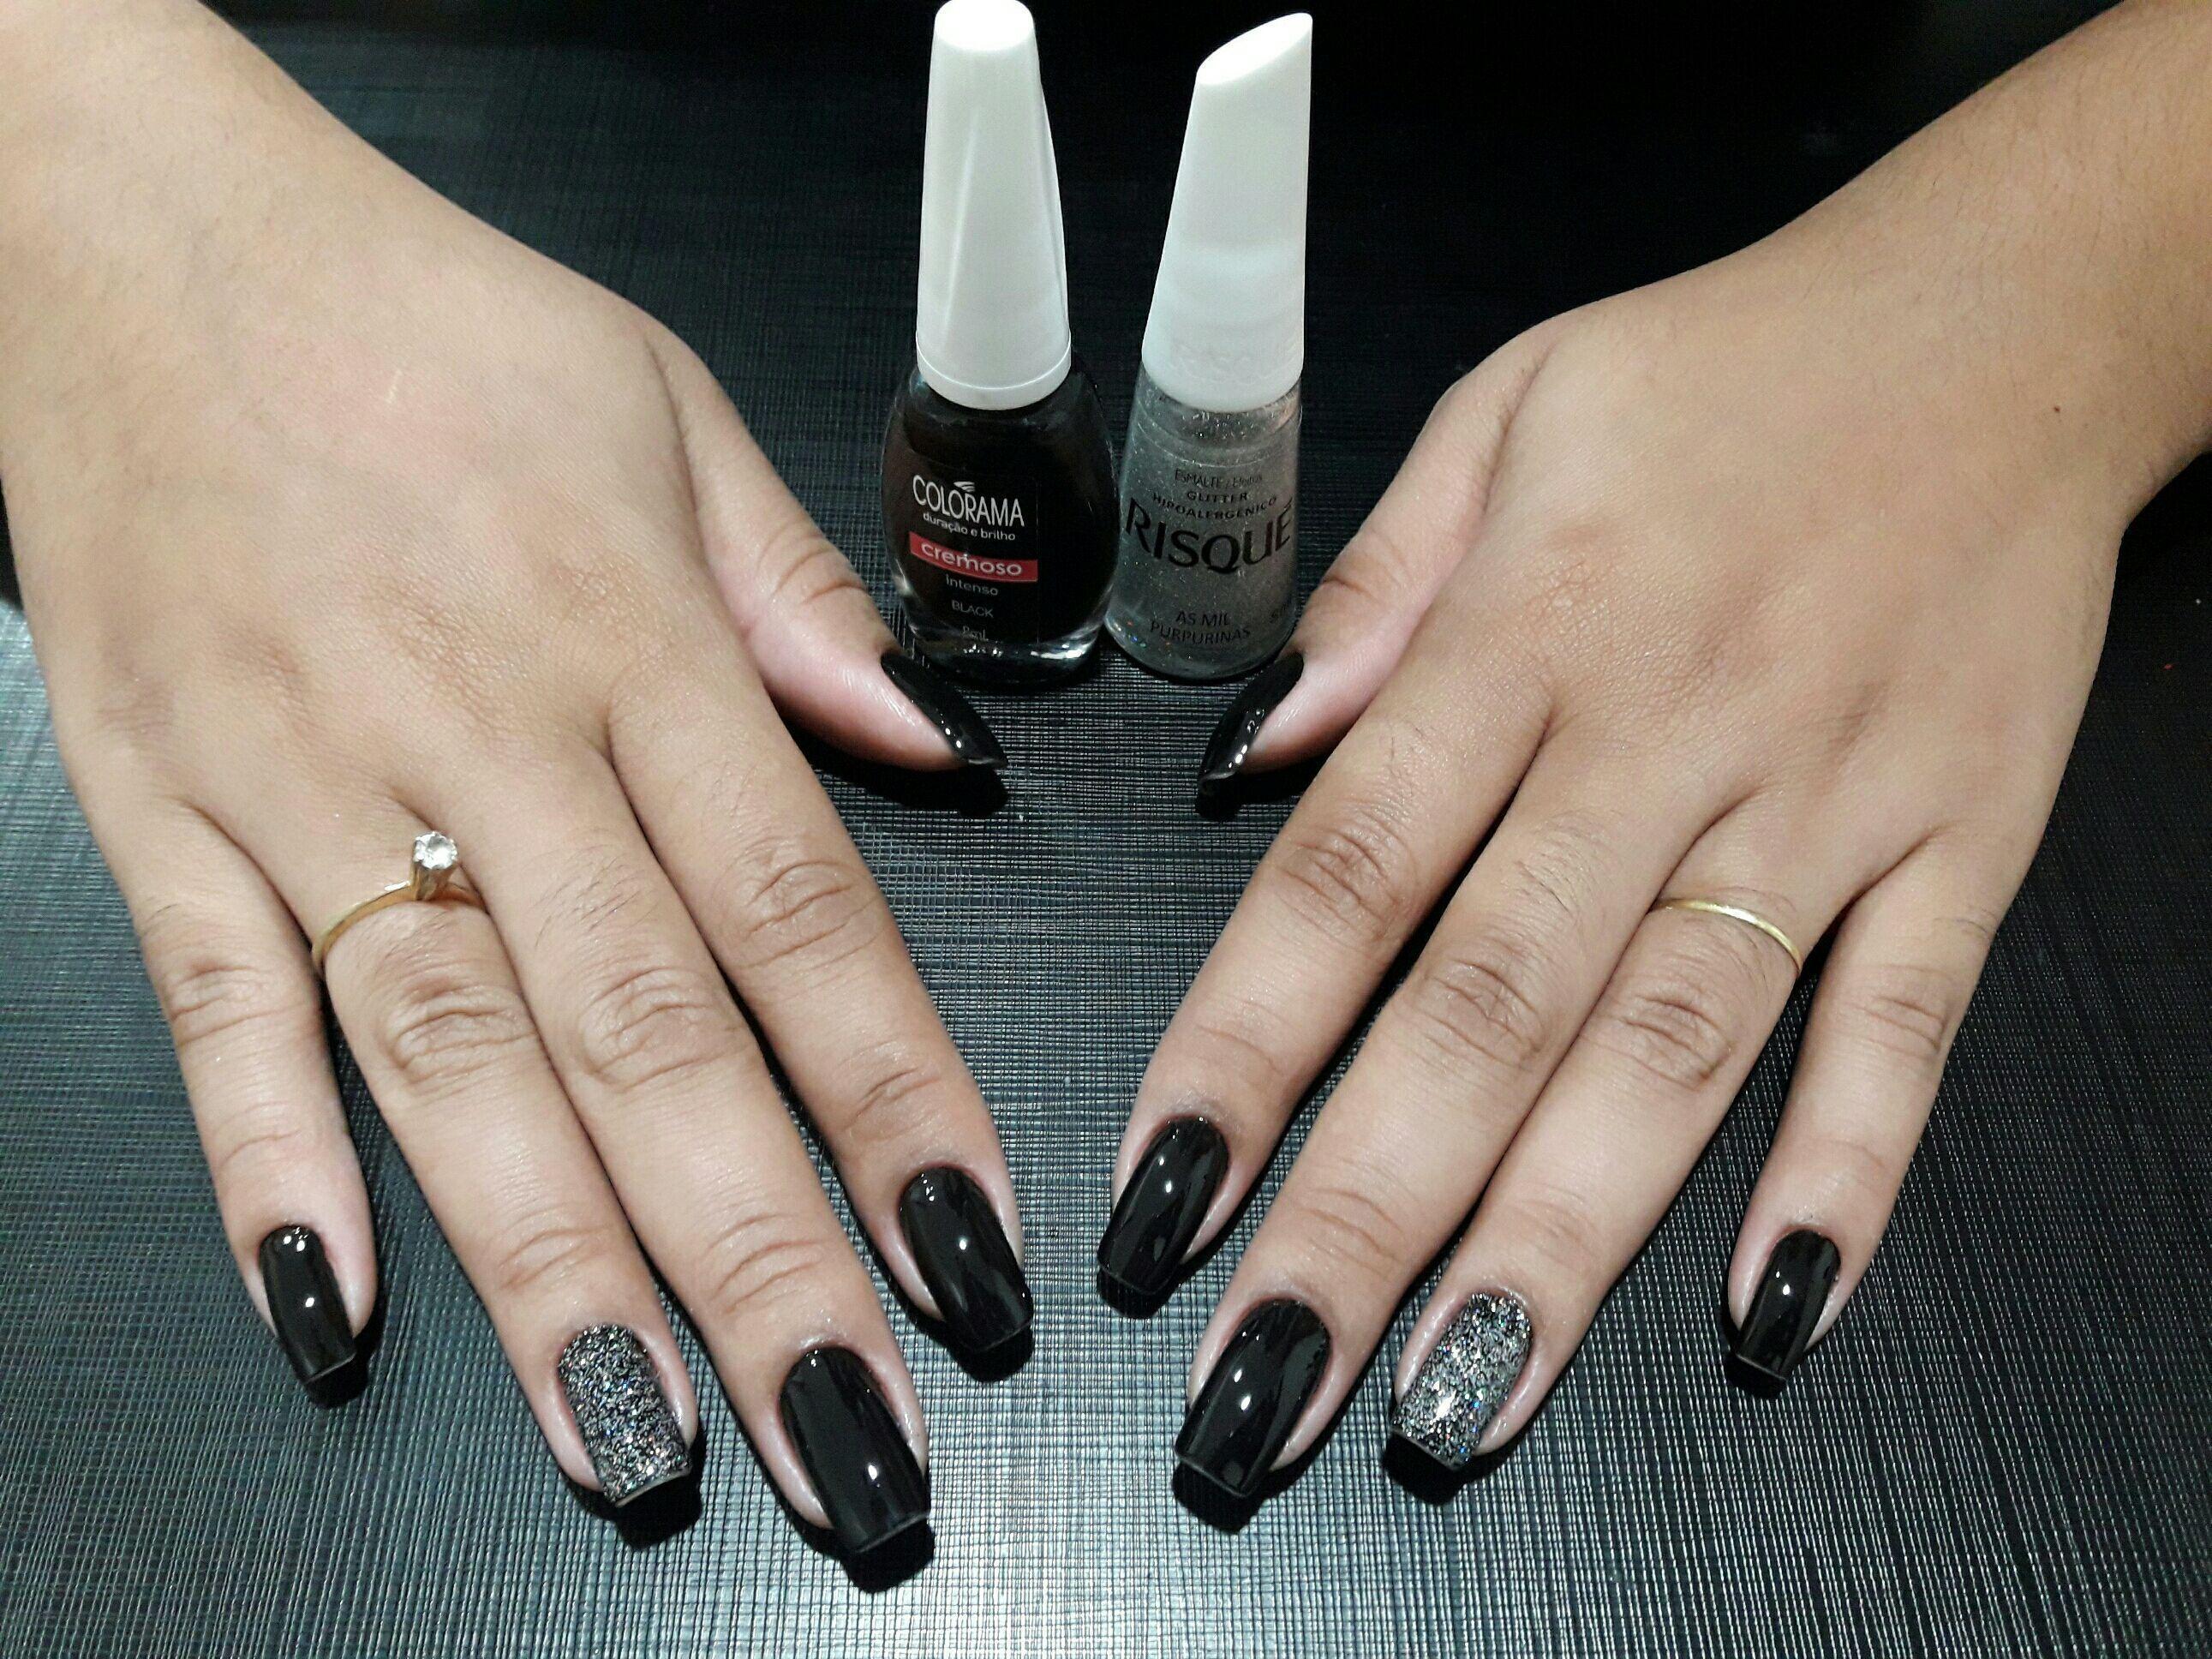 unha manicure e pedicure manicure e pedicure manicure e pedicure manicure e pedicure manicure e pedicure manicure e pedicure manicure e pedicure manicure e pedicure manicure e pedicure manicure e pedicure manicure e pedicure manicure e pedicure manicure e pedicure